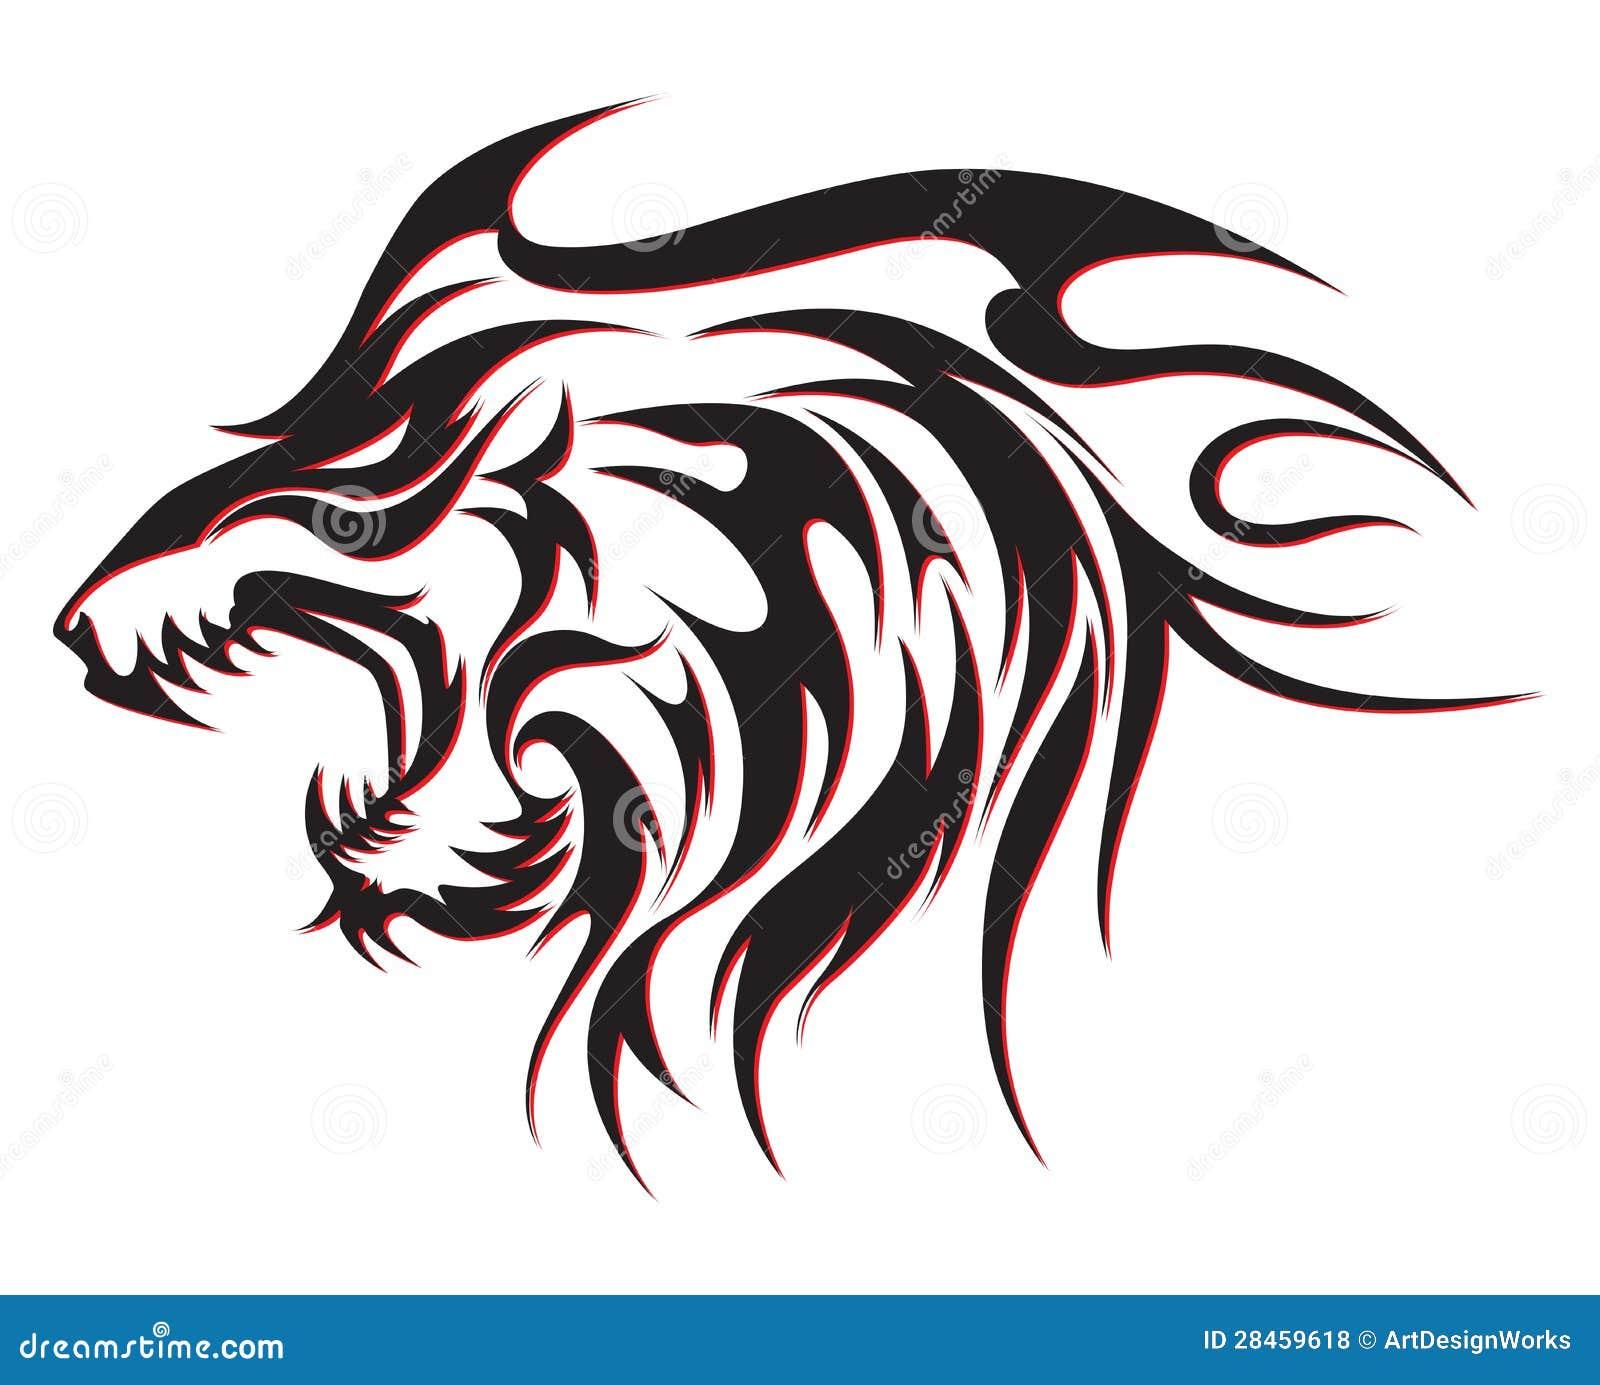 Tatuaggio di Tribalwolf